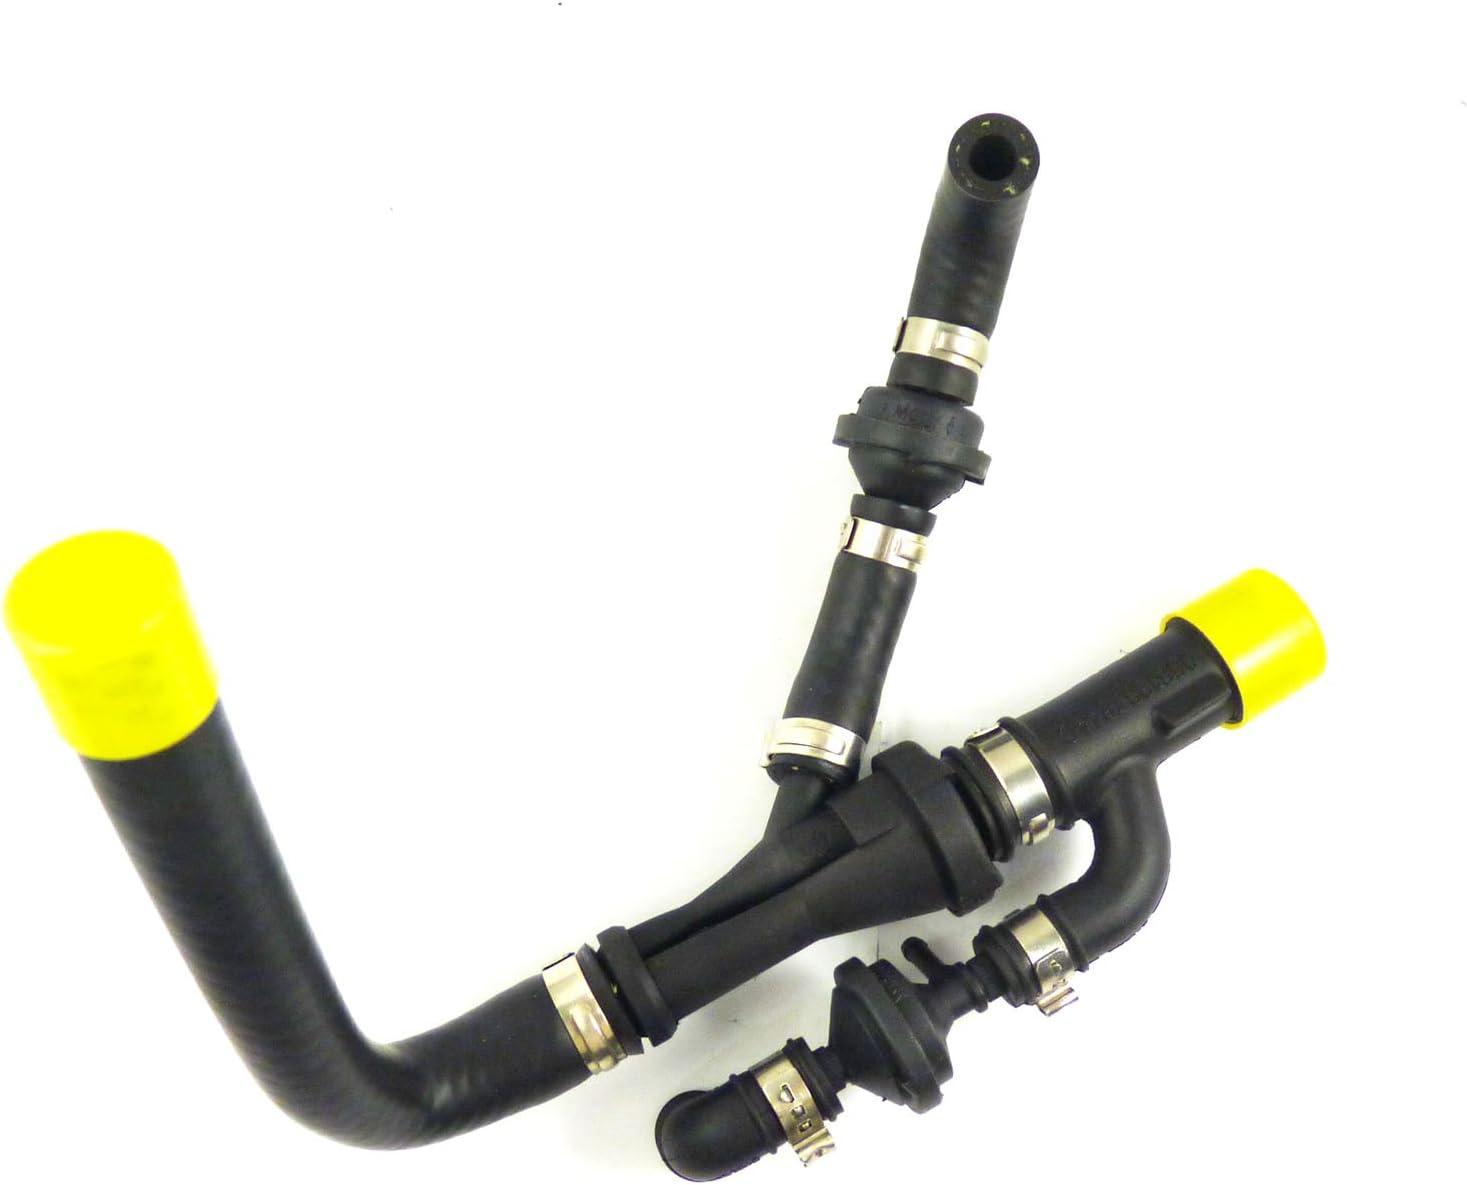 Qty 10 Air Pump Check Valve For VW Passat B5 AUDI A4 A6 Skoda Superb 1.8 t 2.0 t